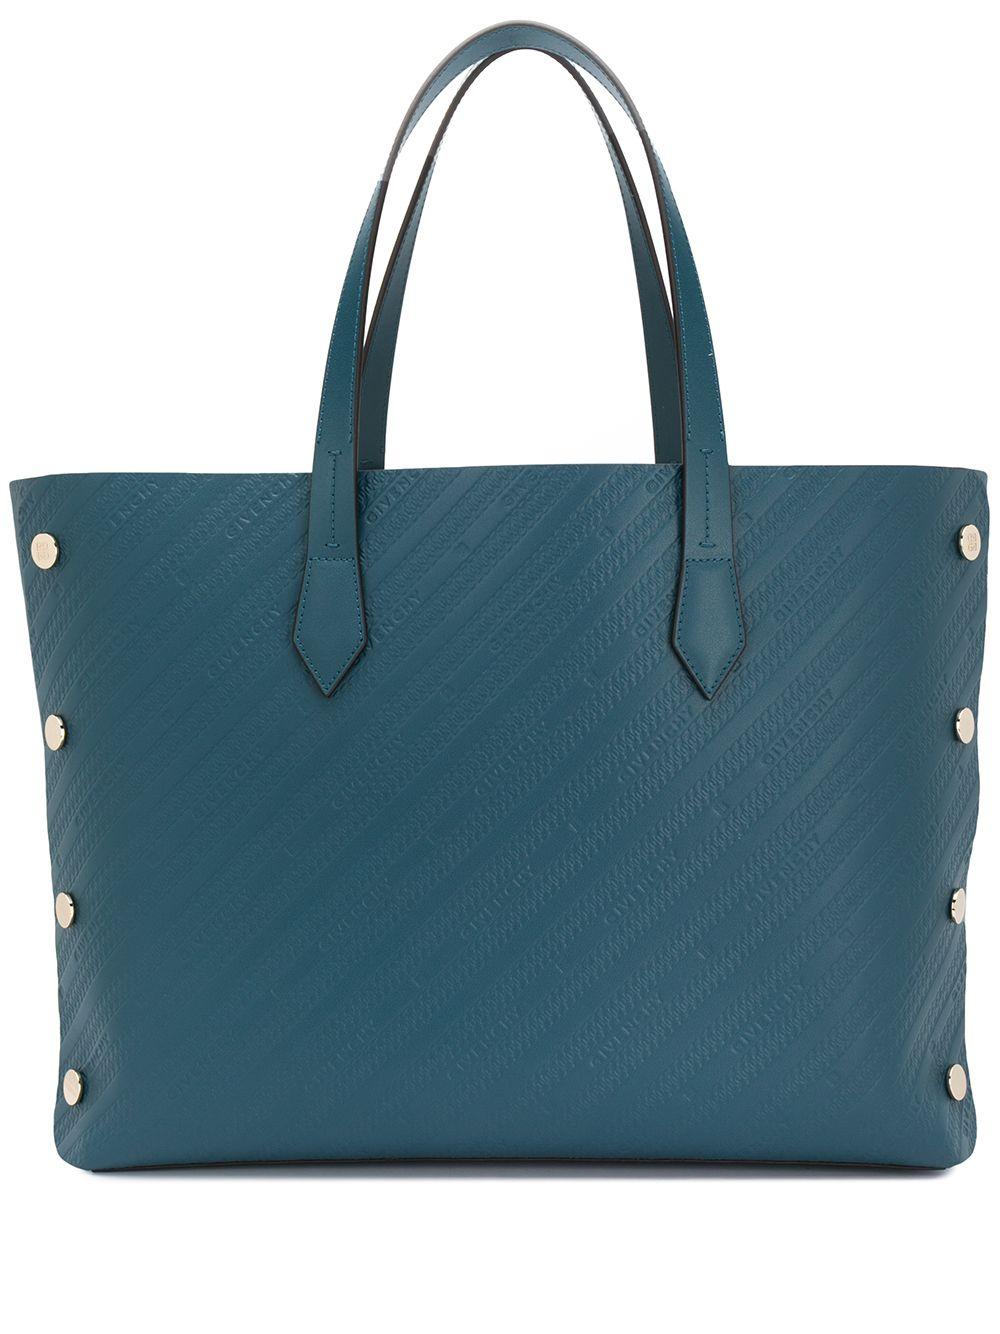 Bond Leather Shopper Bag